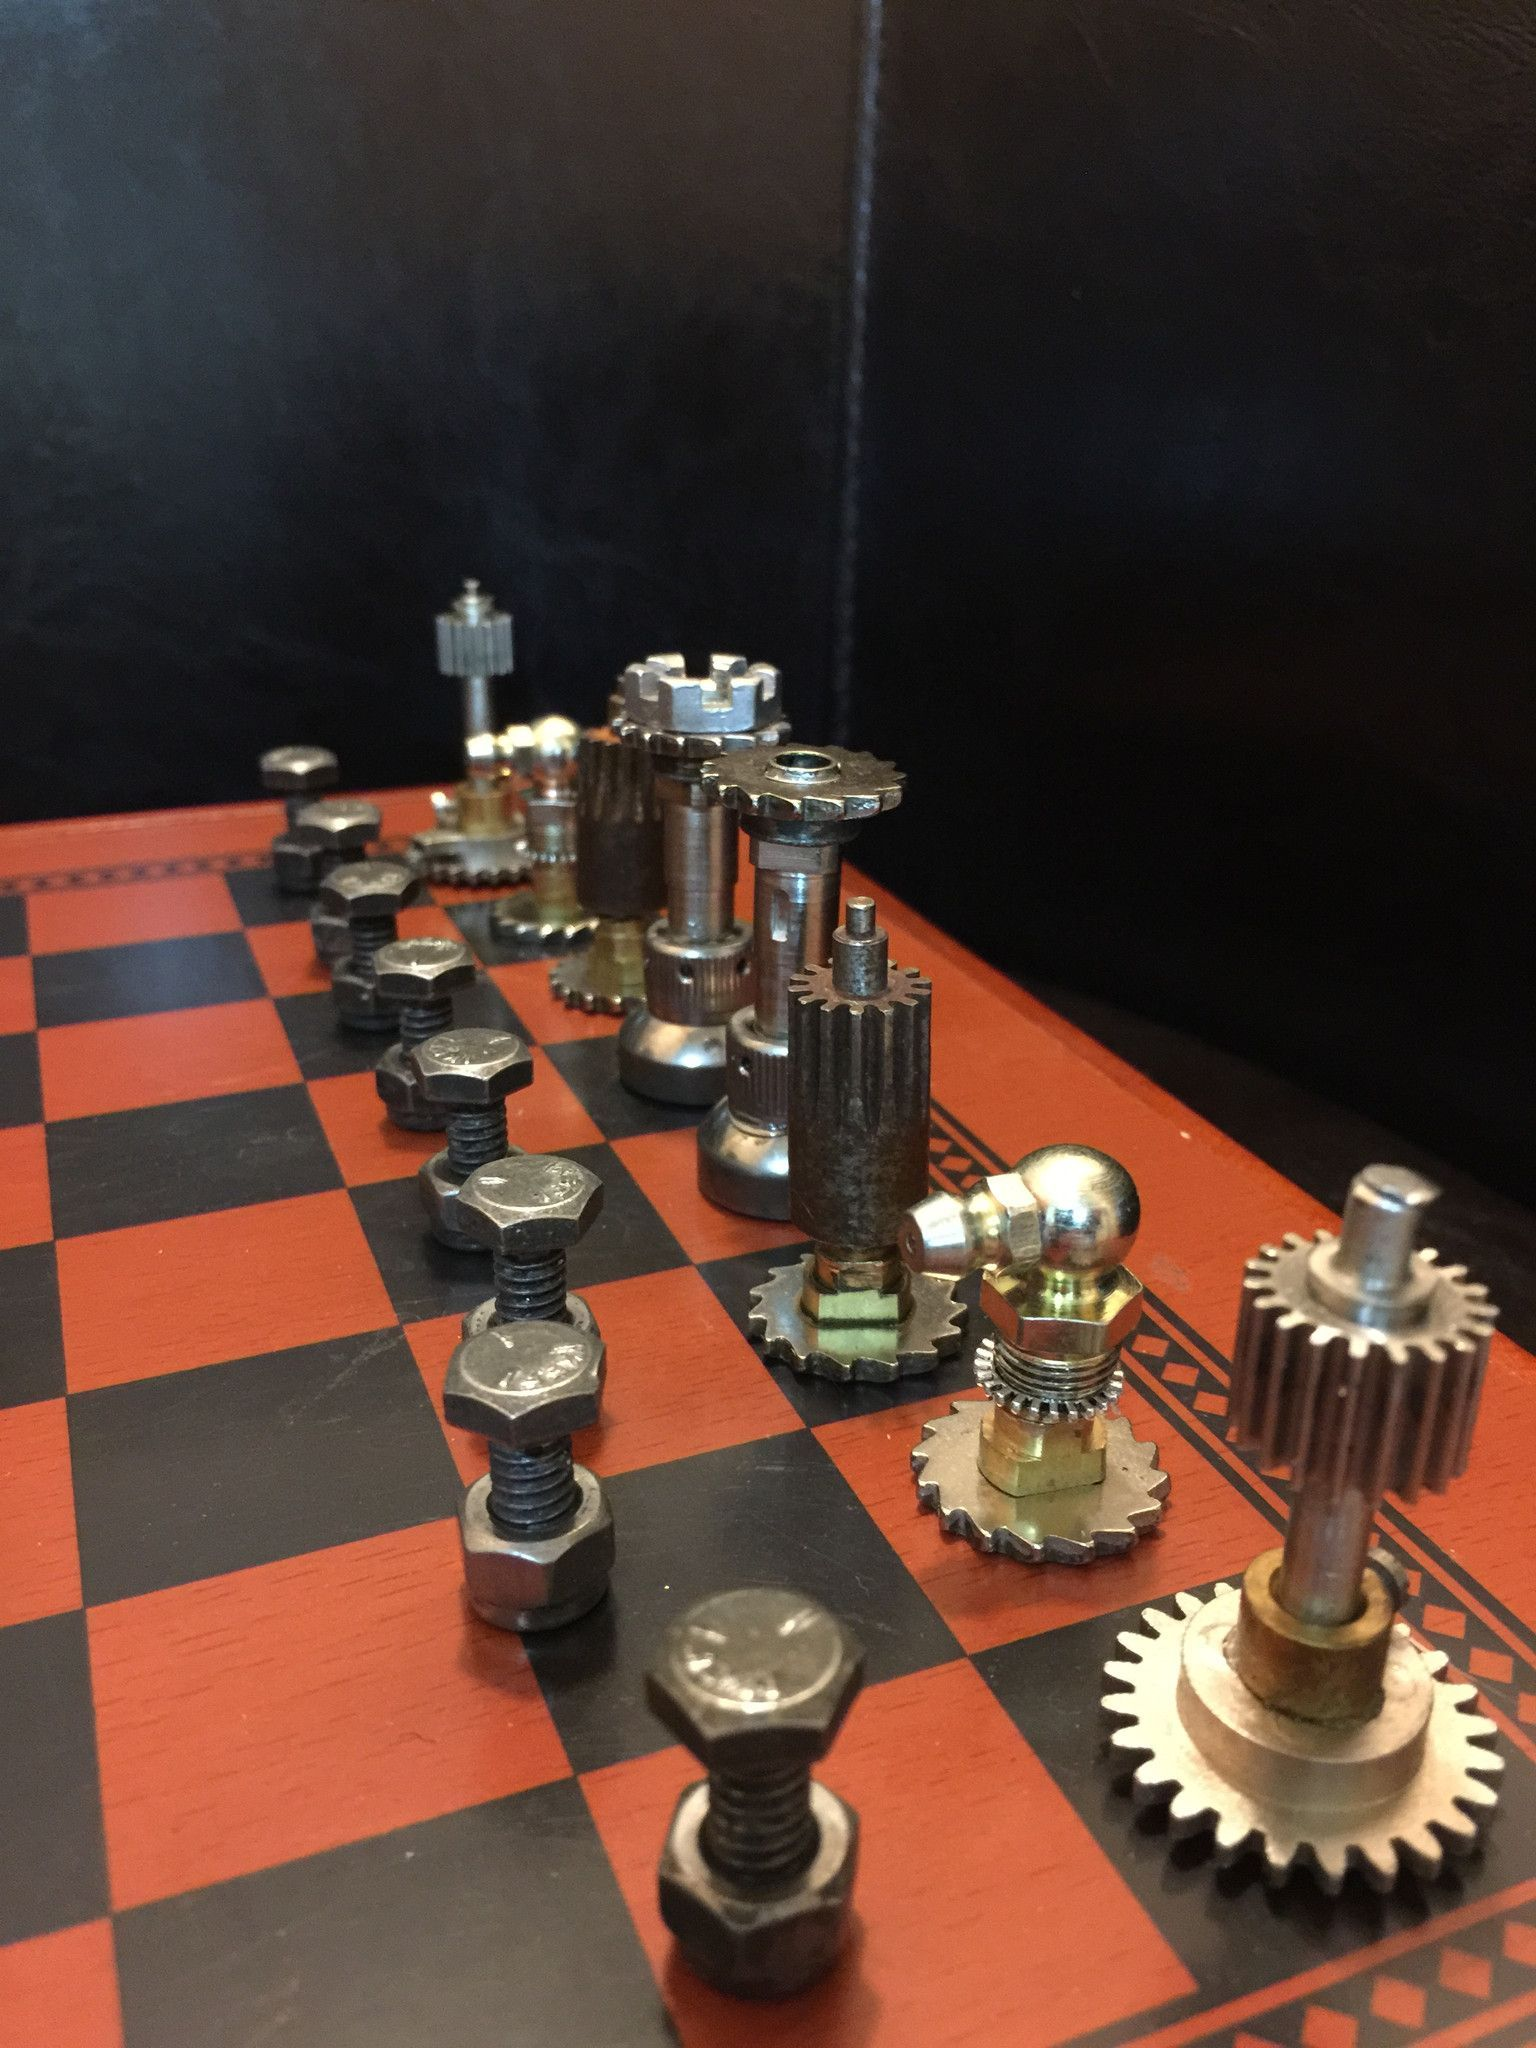 Steampunk Chess Set Chess, Chess set, Chess game